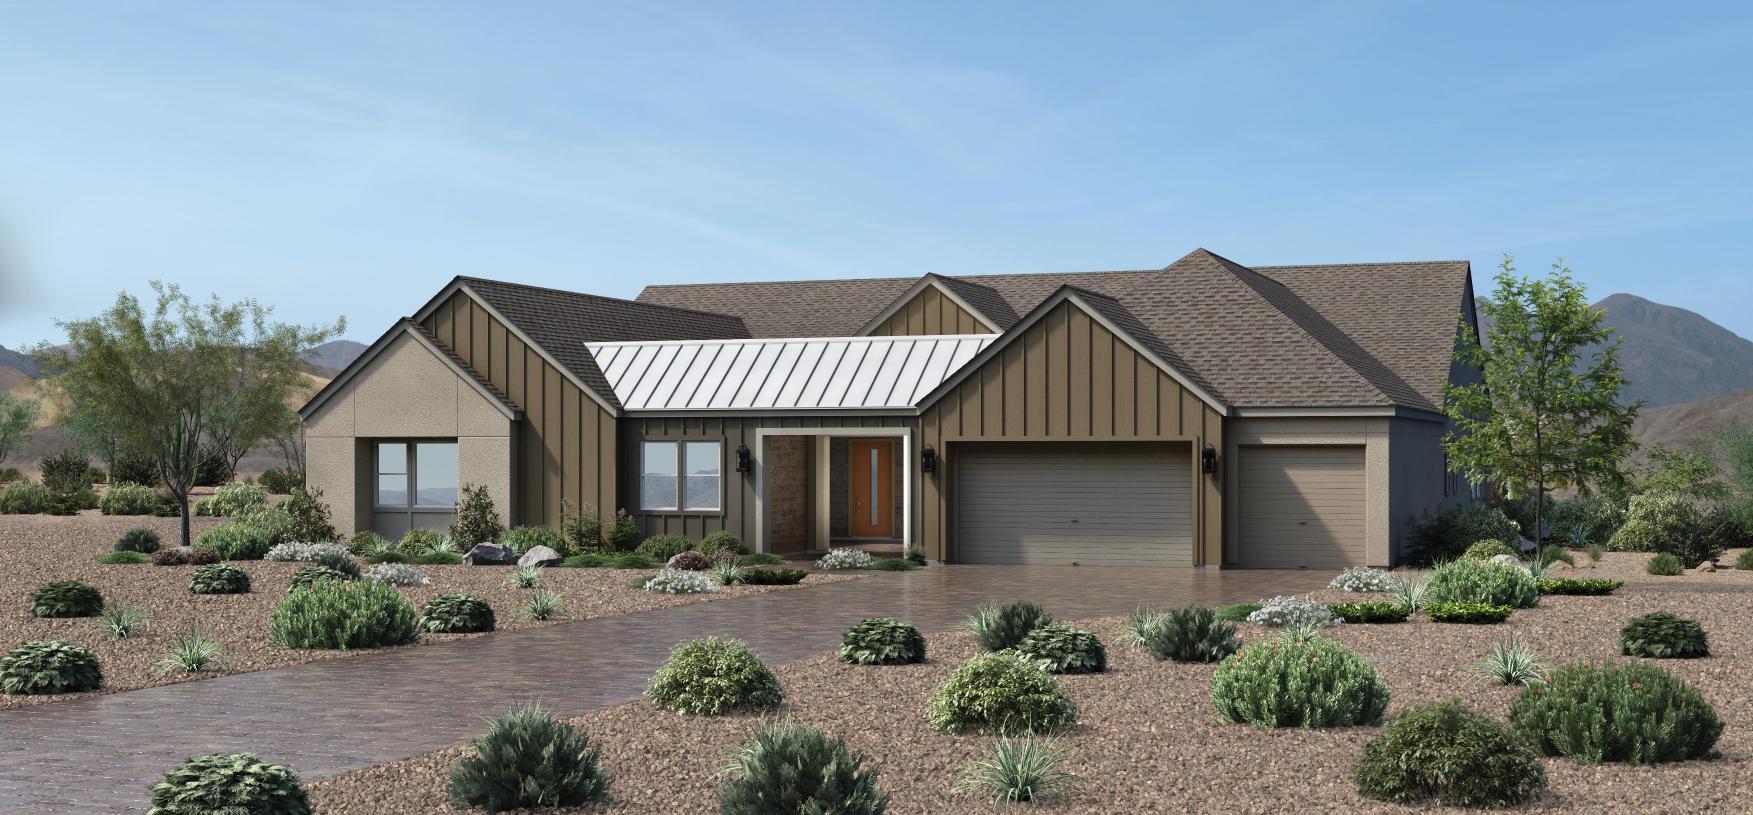 Primrose -  Modern Farmhouse